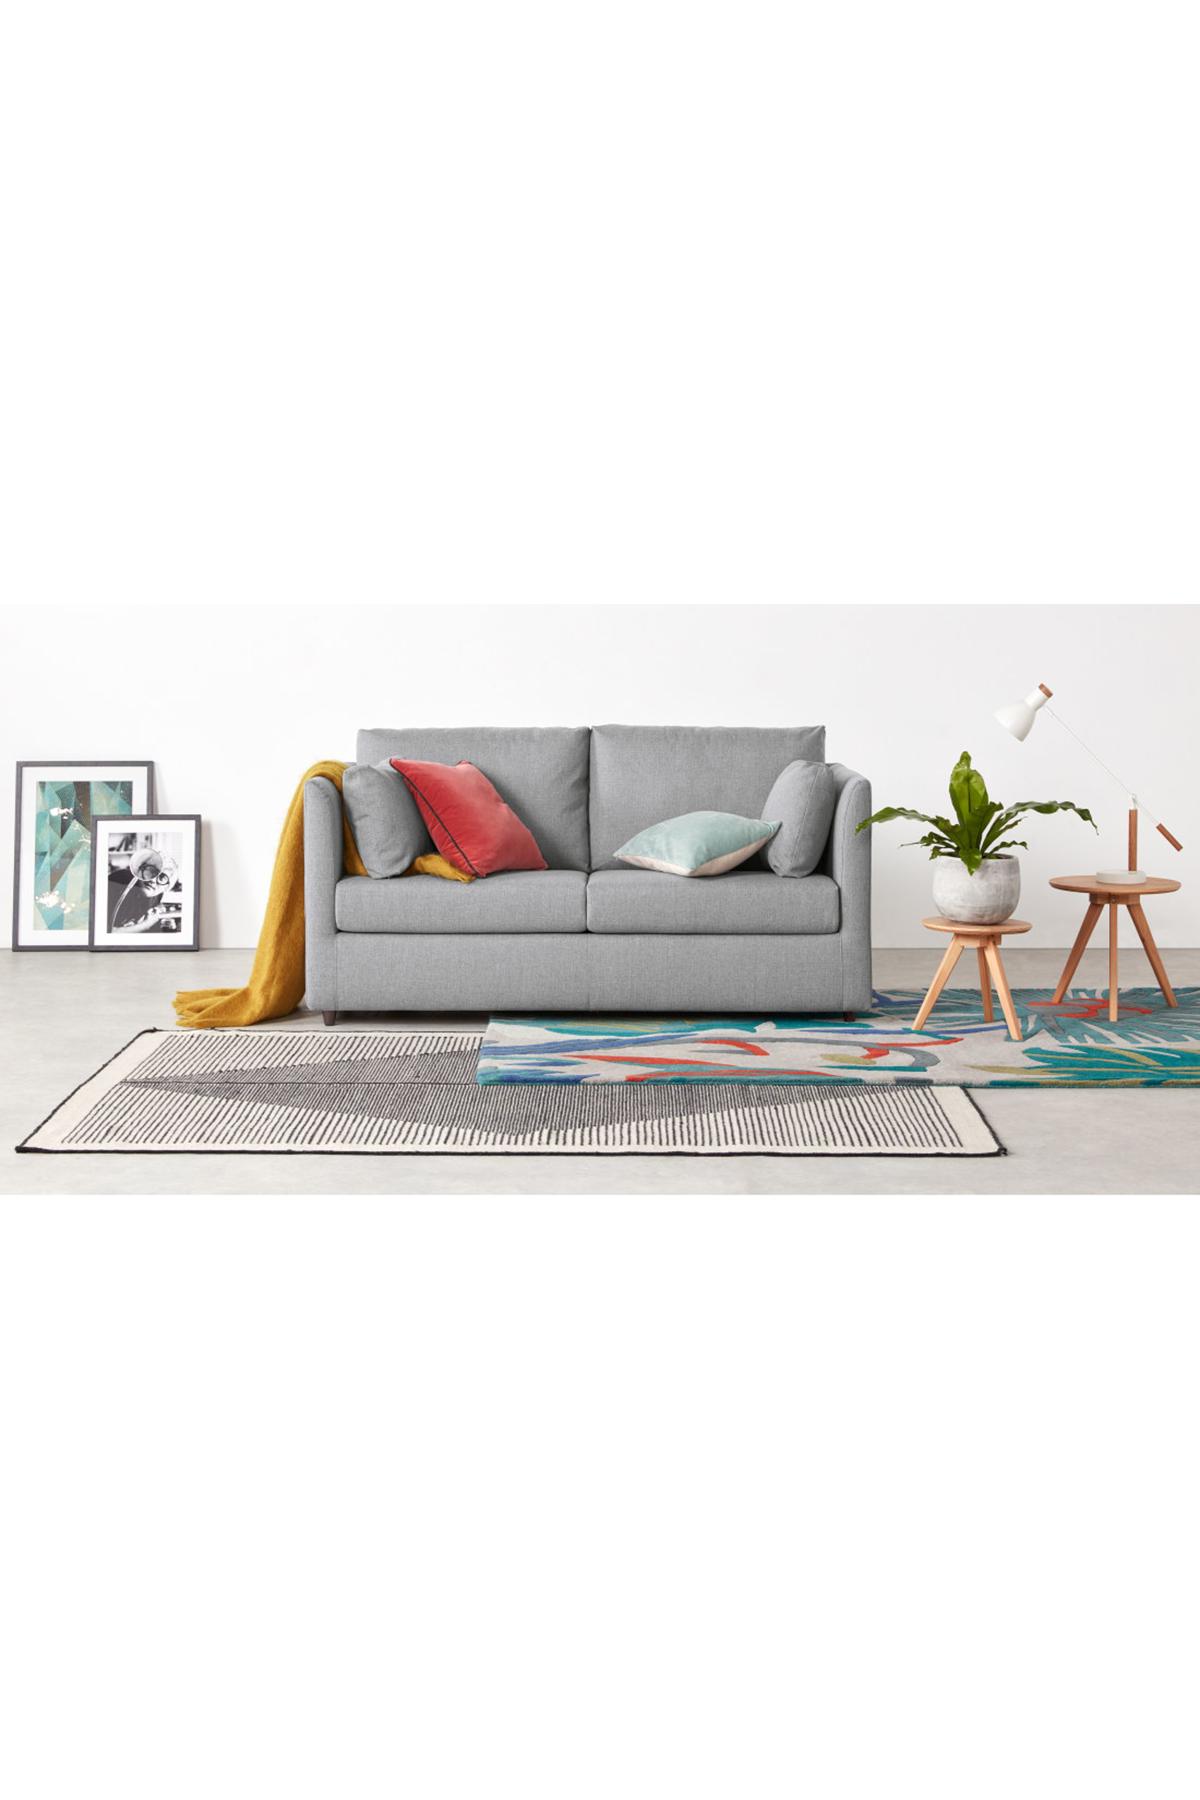 Made Granite Grey Sofa Bed Grey Sofa Bed Sofa Bed Sofa Bed